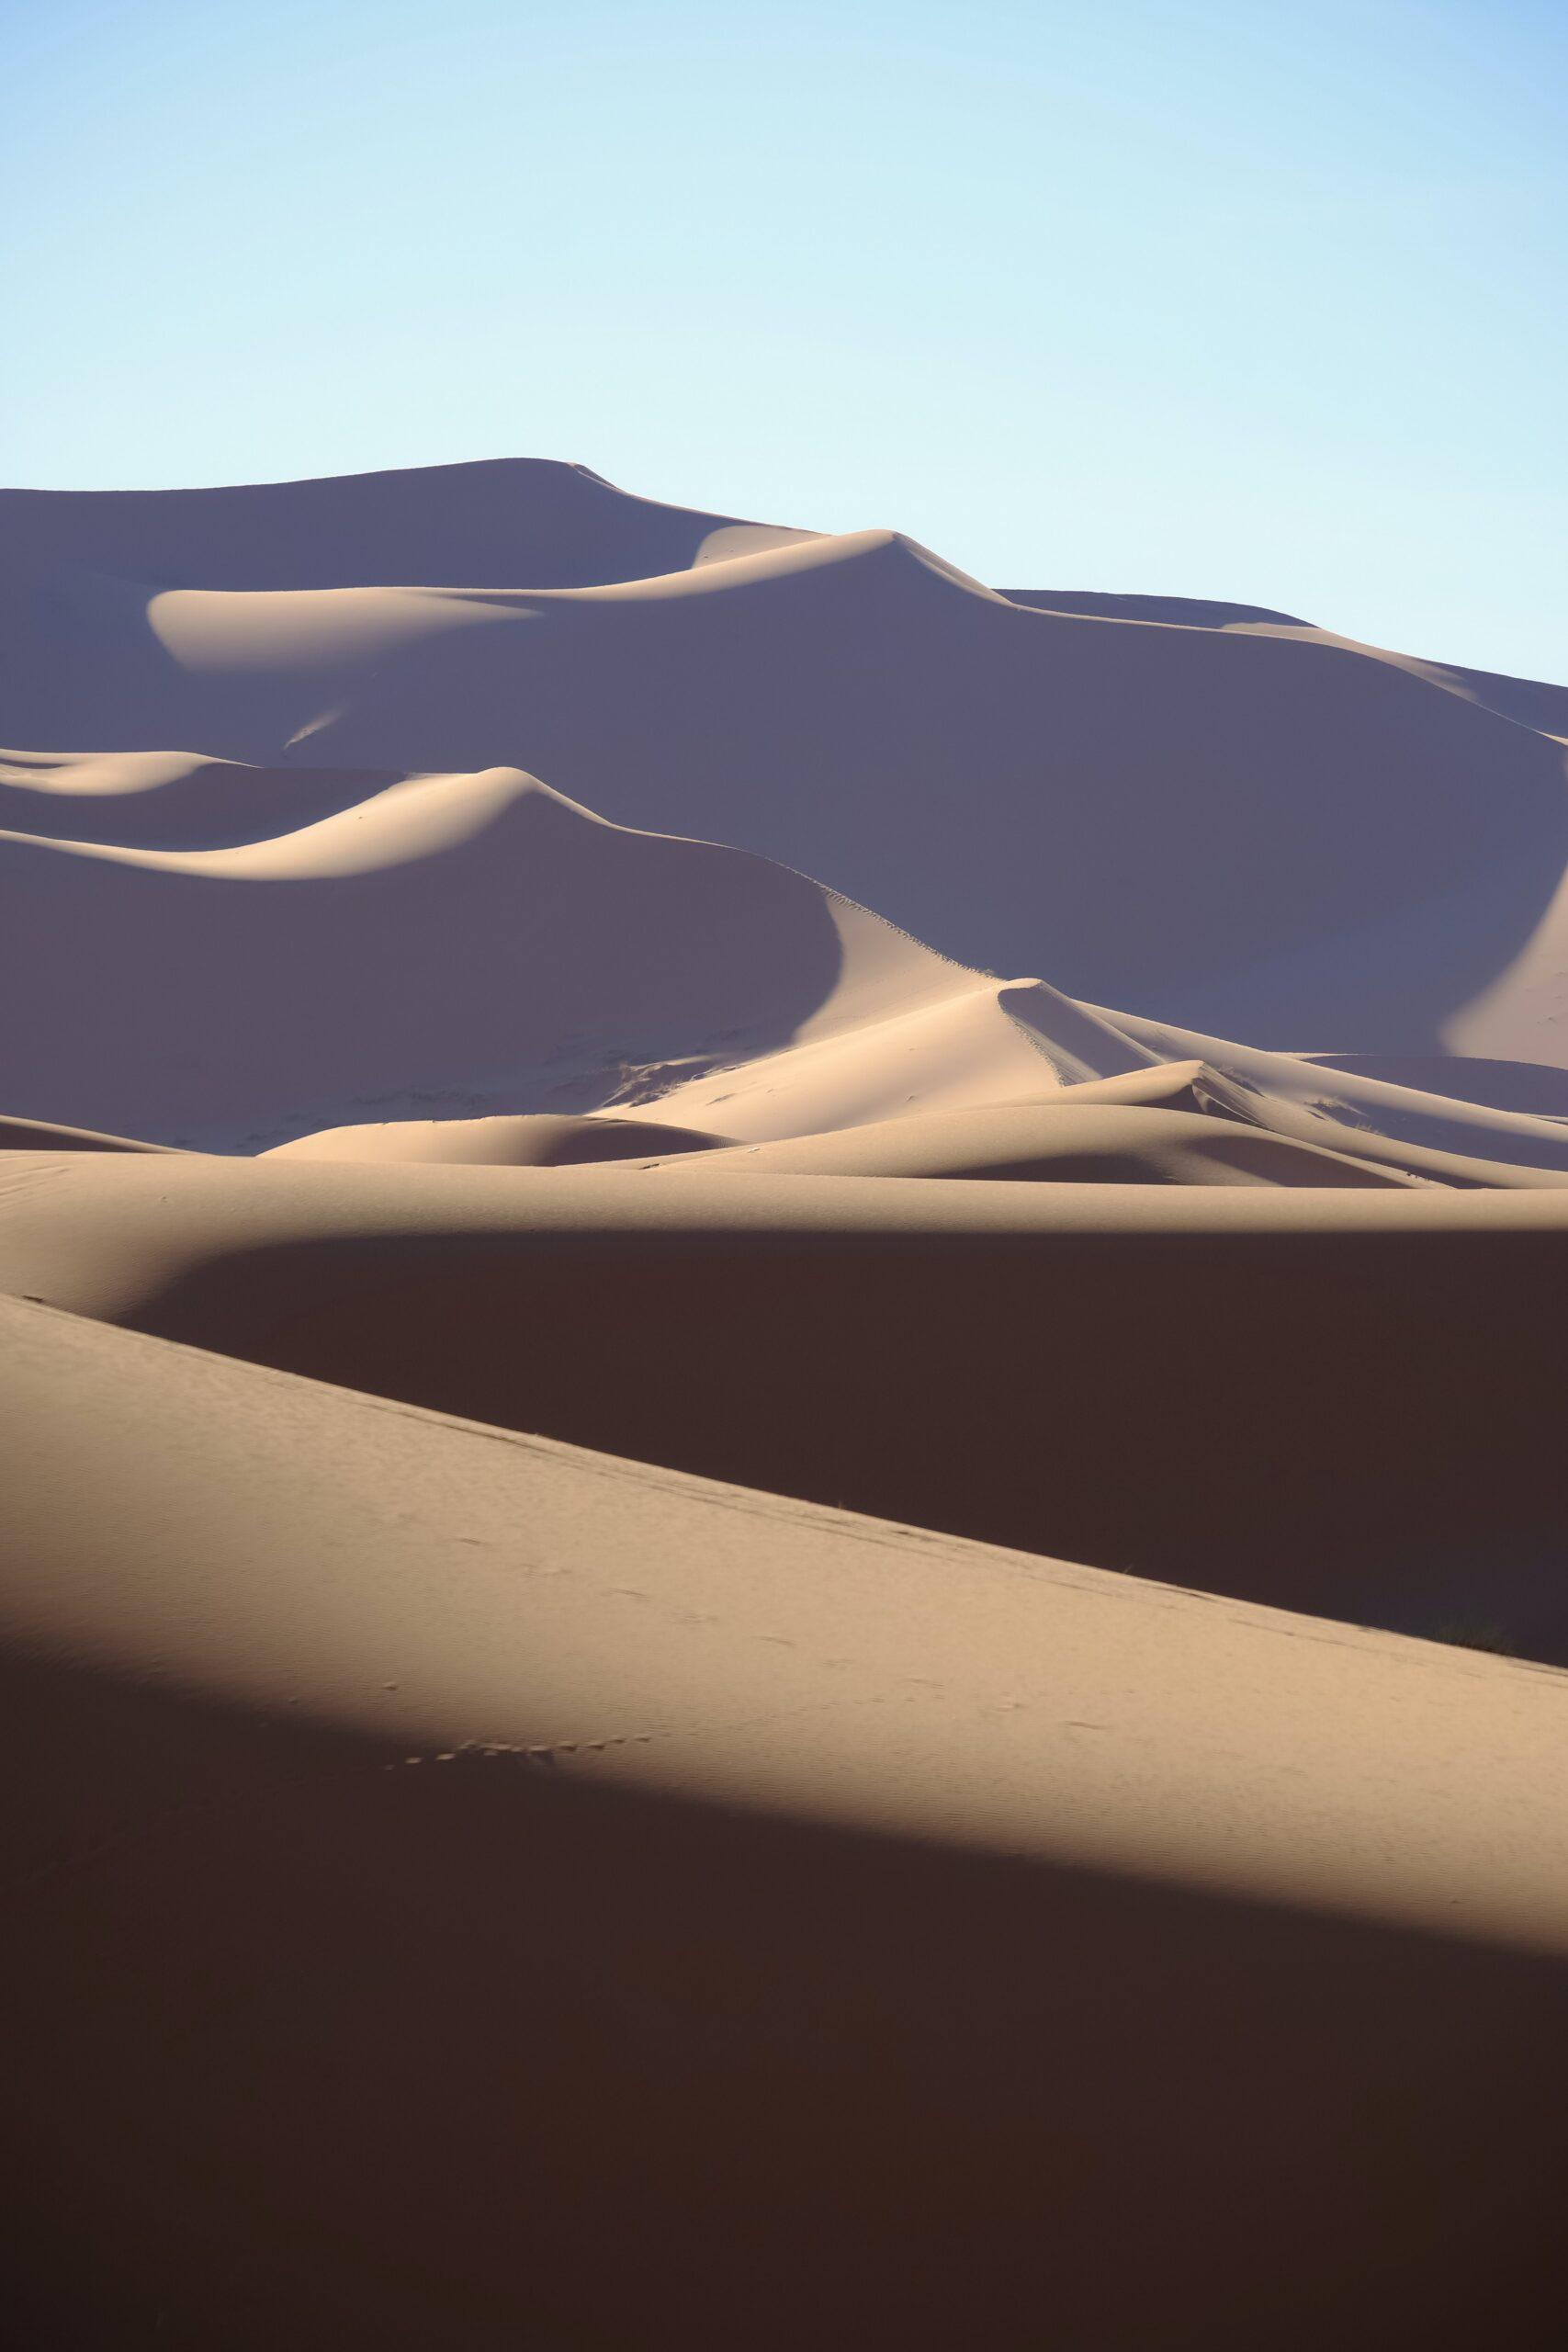 zack-woolwine-Sand dunes-unsplash